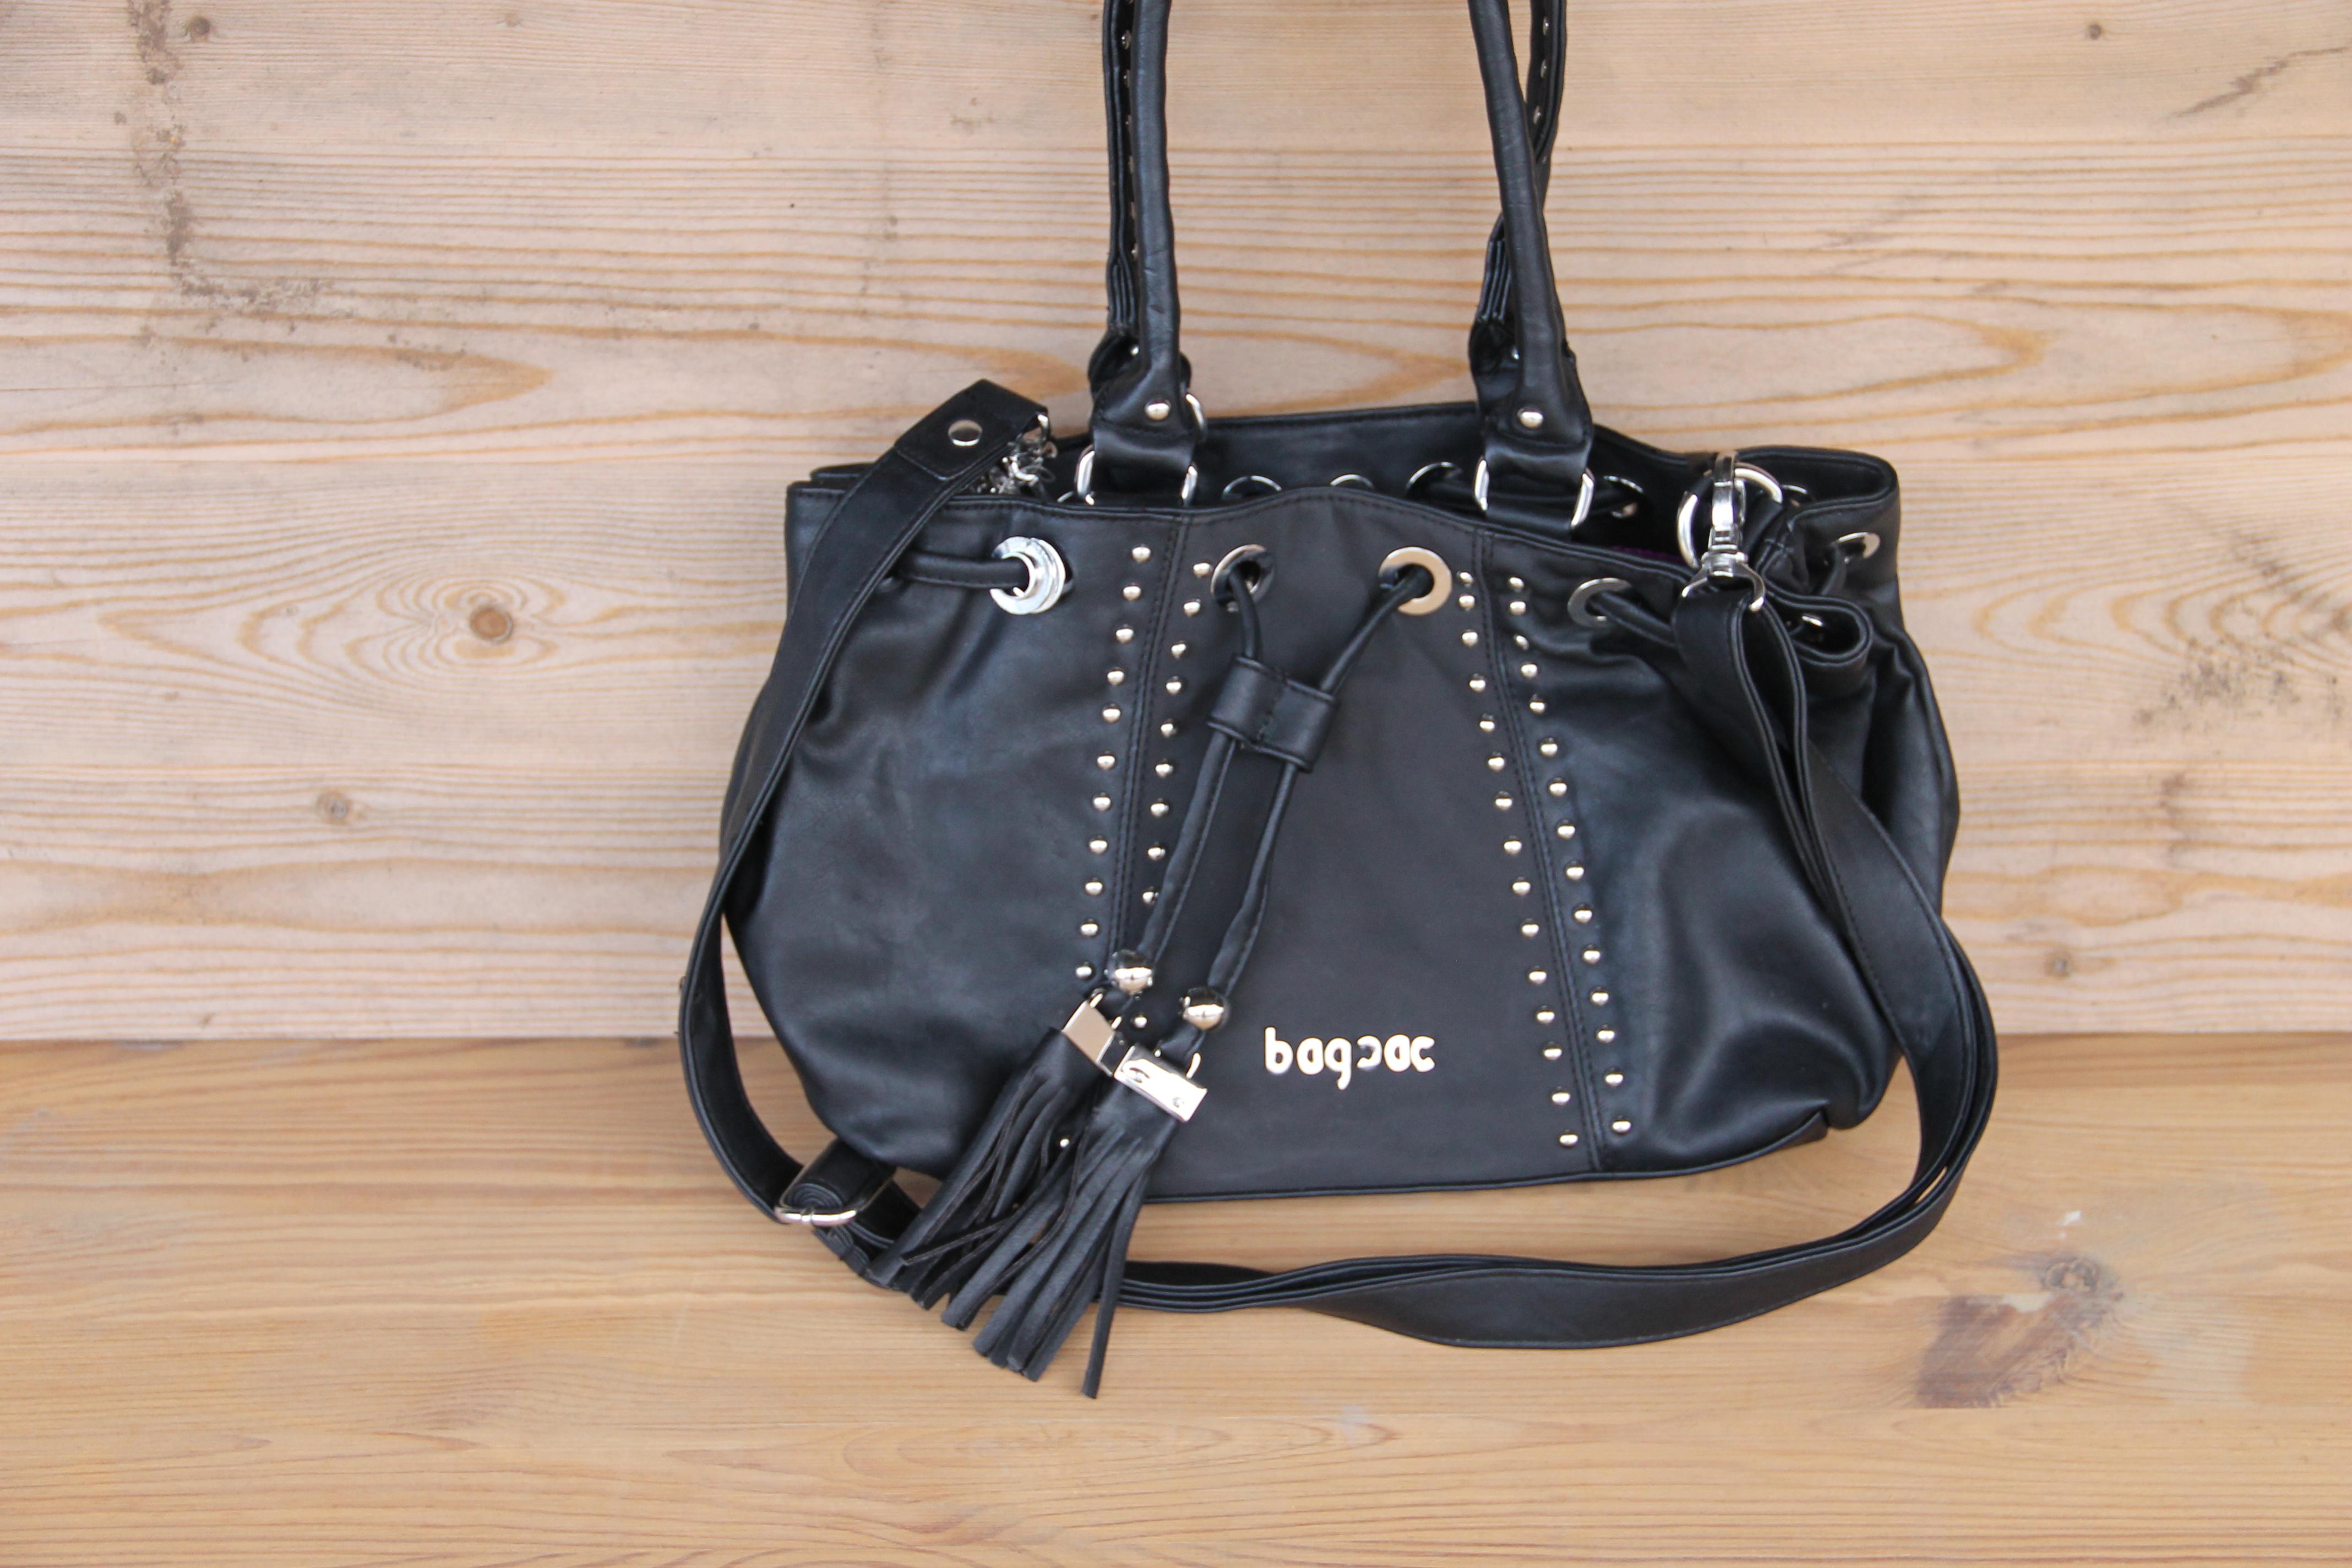 ca1b5f2879e Design Bagsac tas #17 | JouwVeilingen.nl webshop